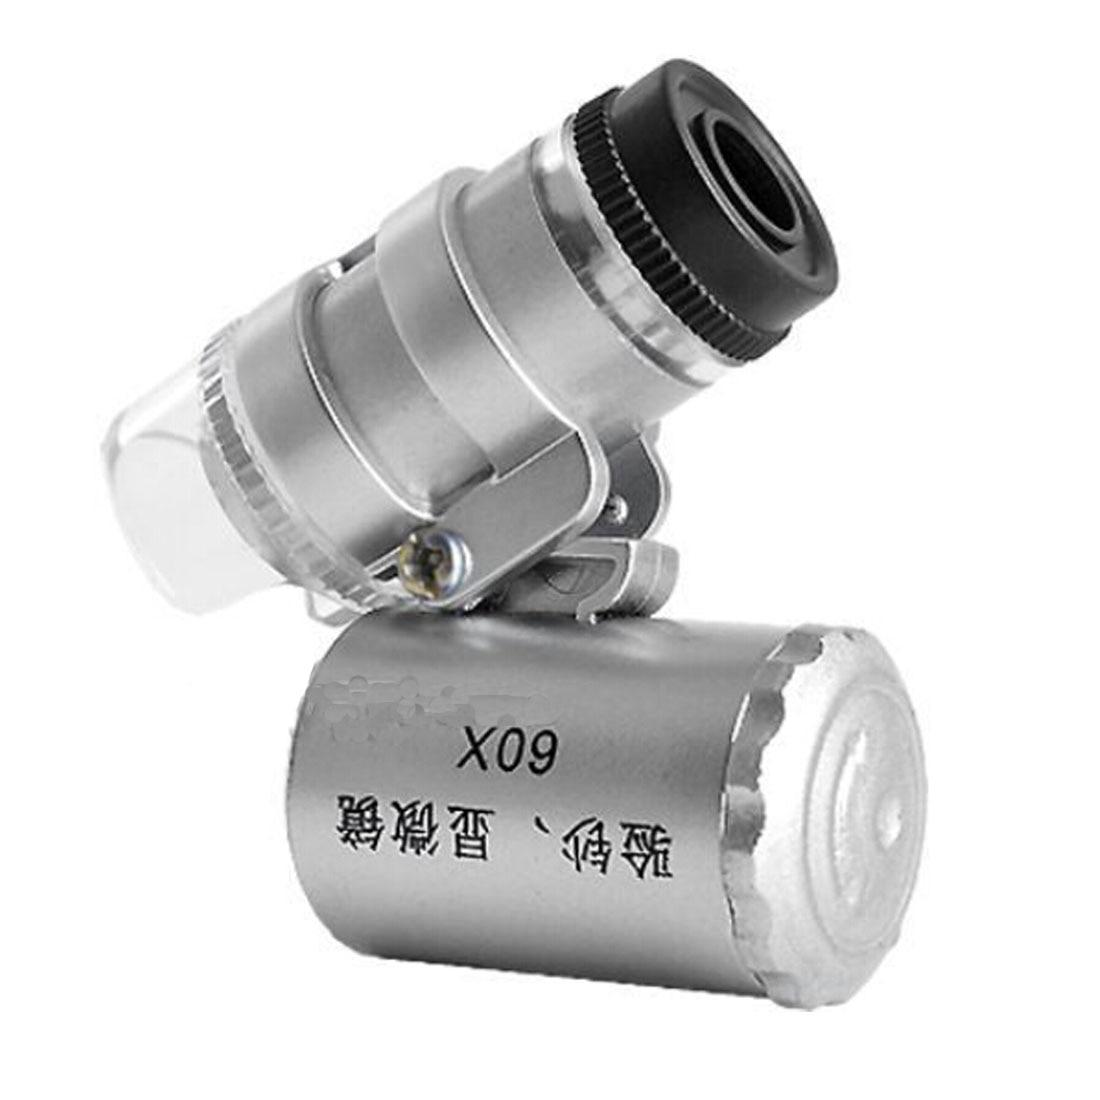 Illuminated Magnifier Glass 60X Mini Microscope Jeweler Loupe Lens 3 LED With UV Light